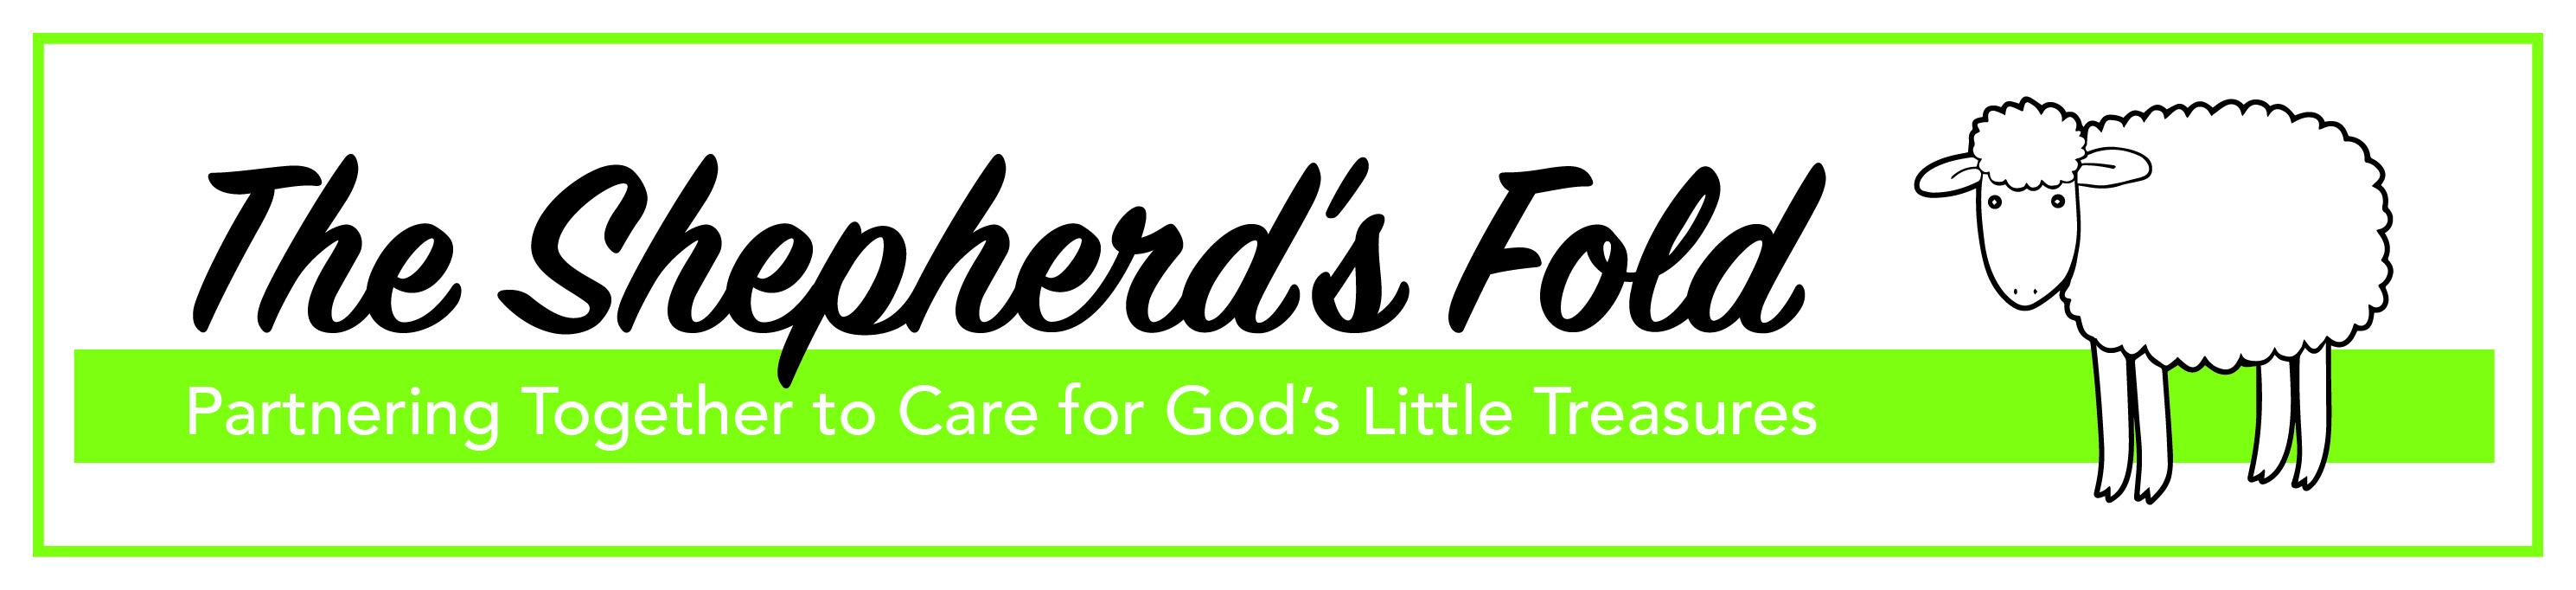 The Shepherd's Fold